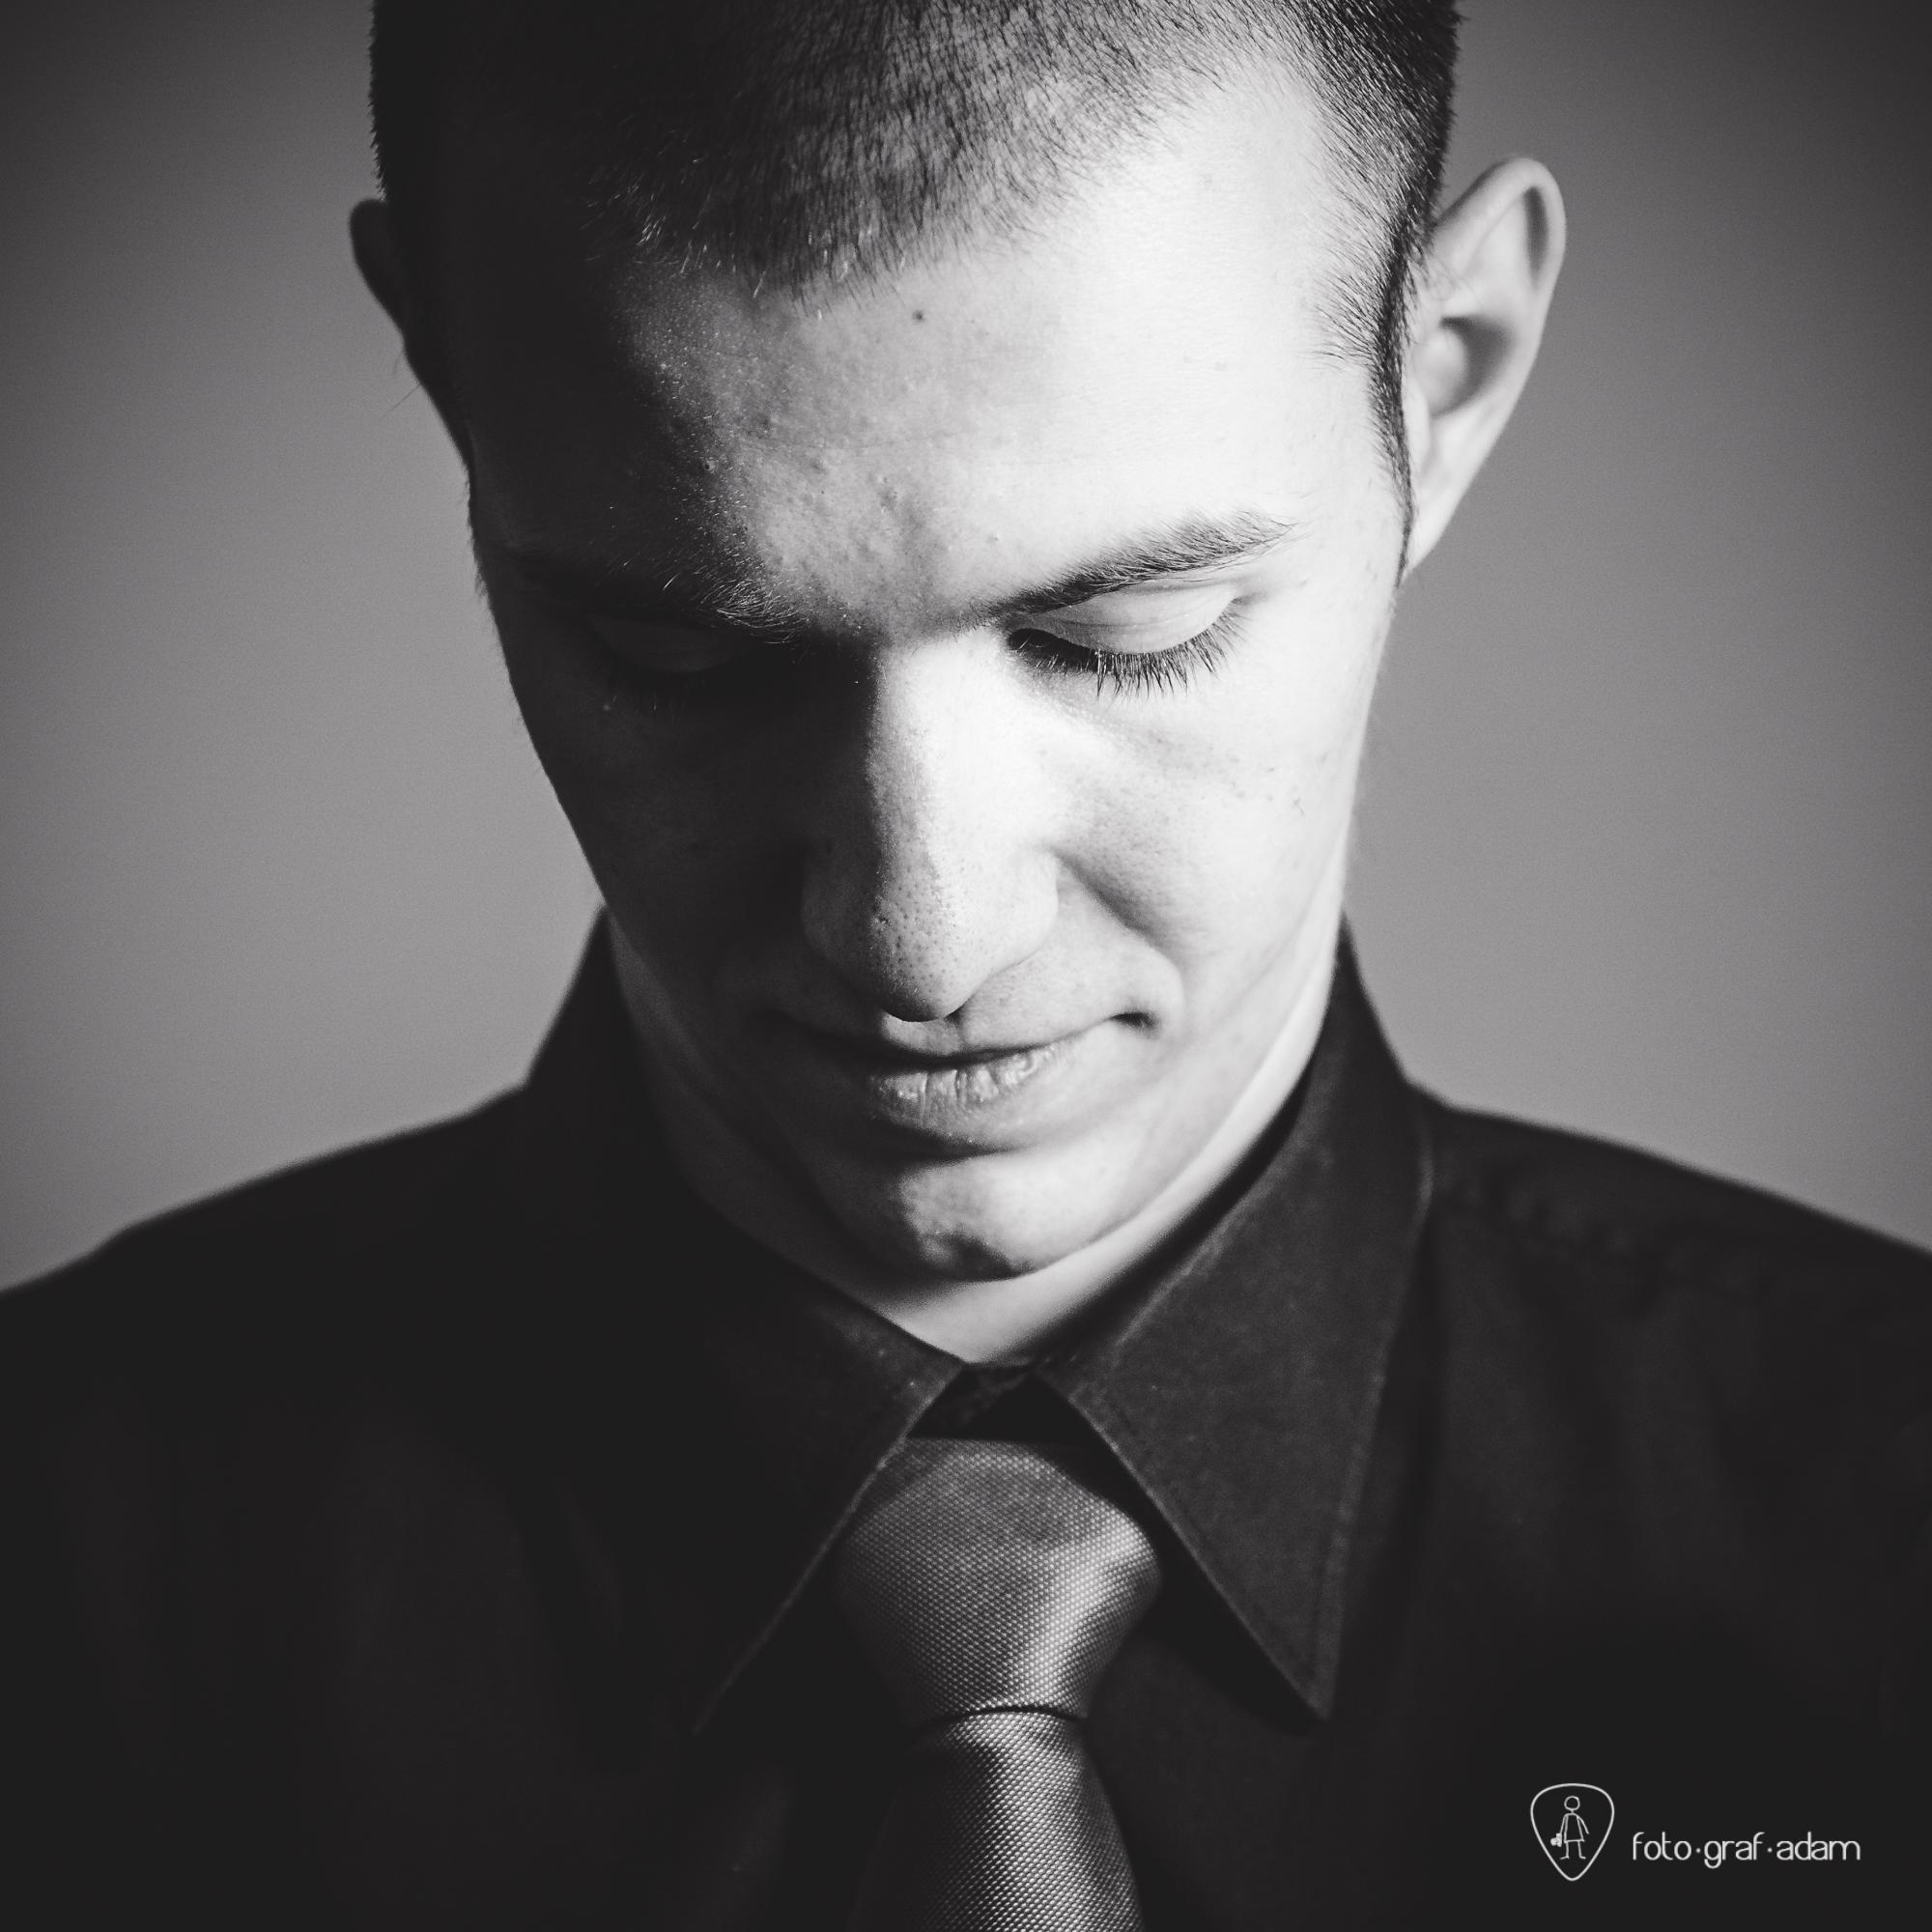 Dávid portré